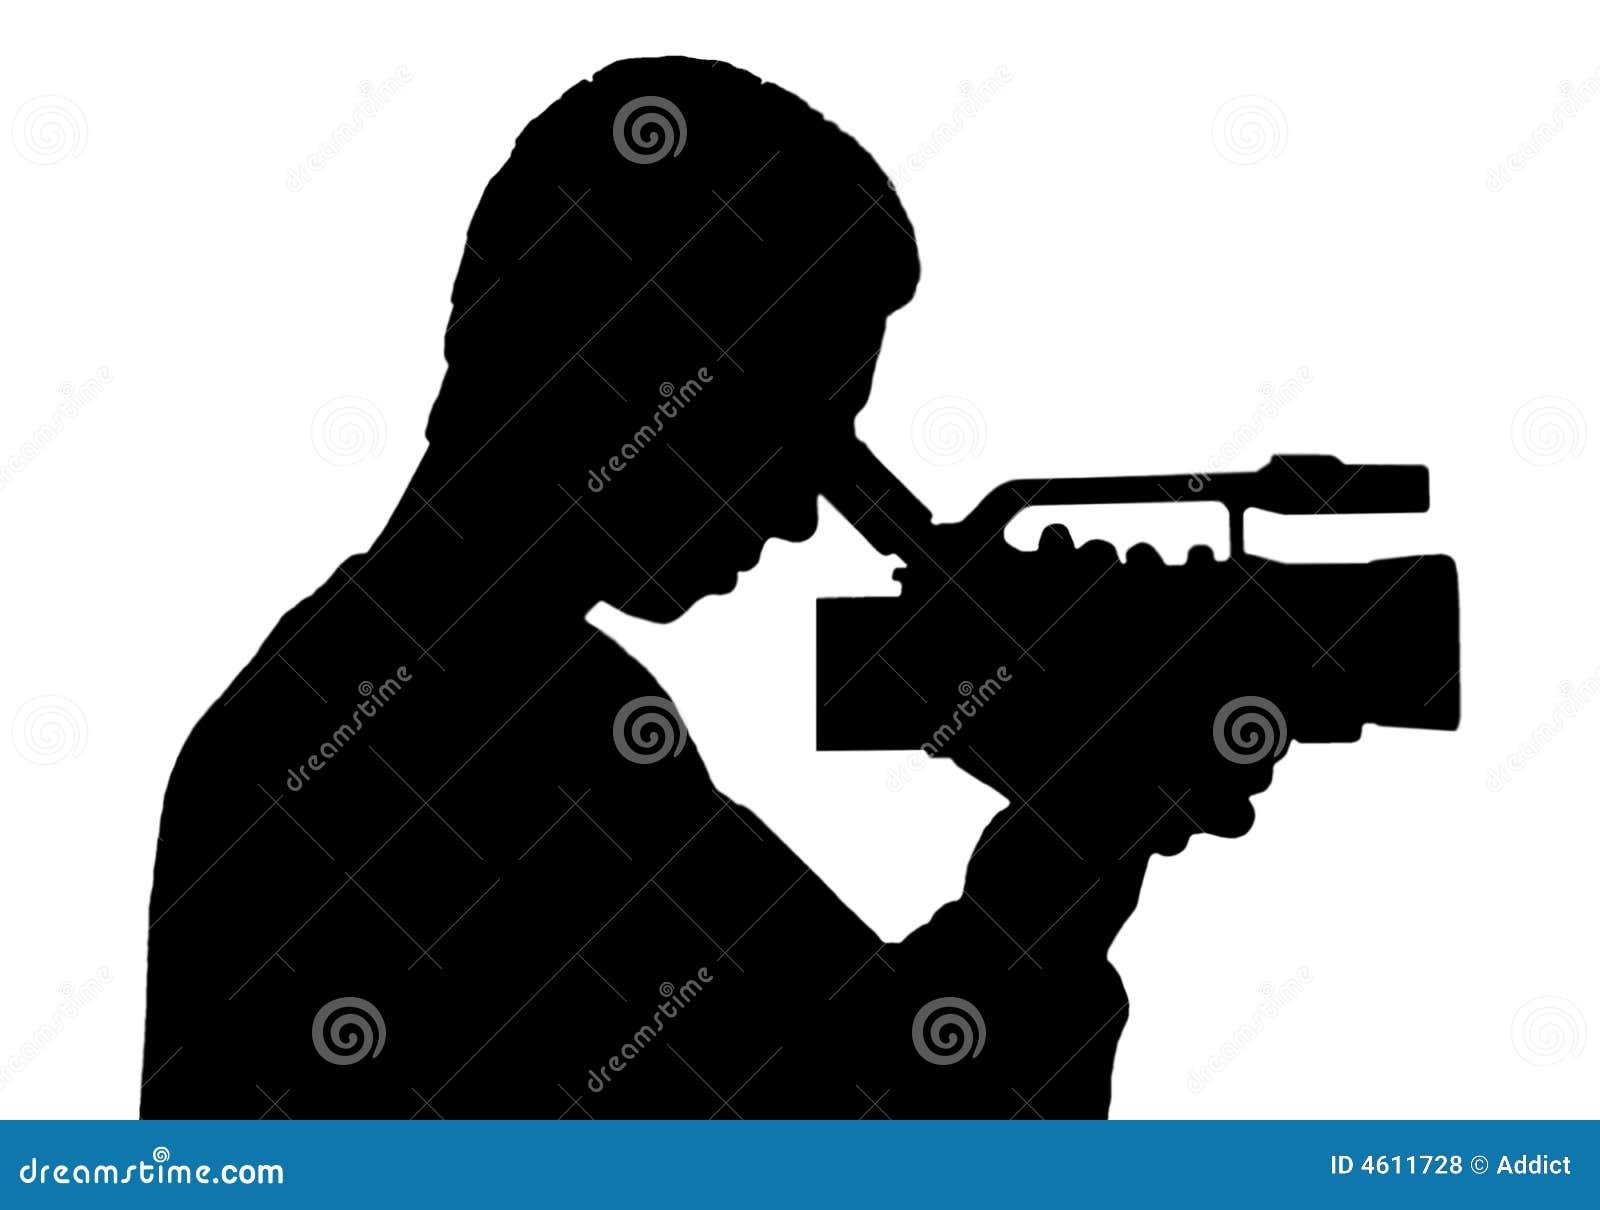 Hombre de la cámara (silueta)